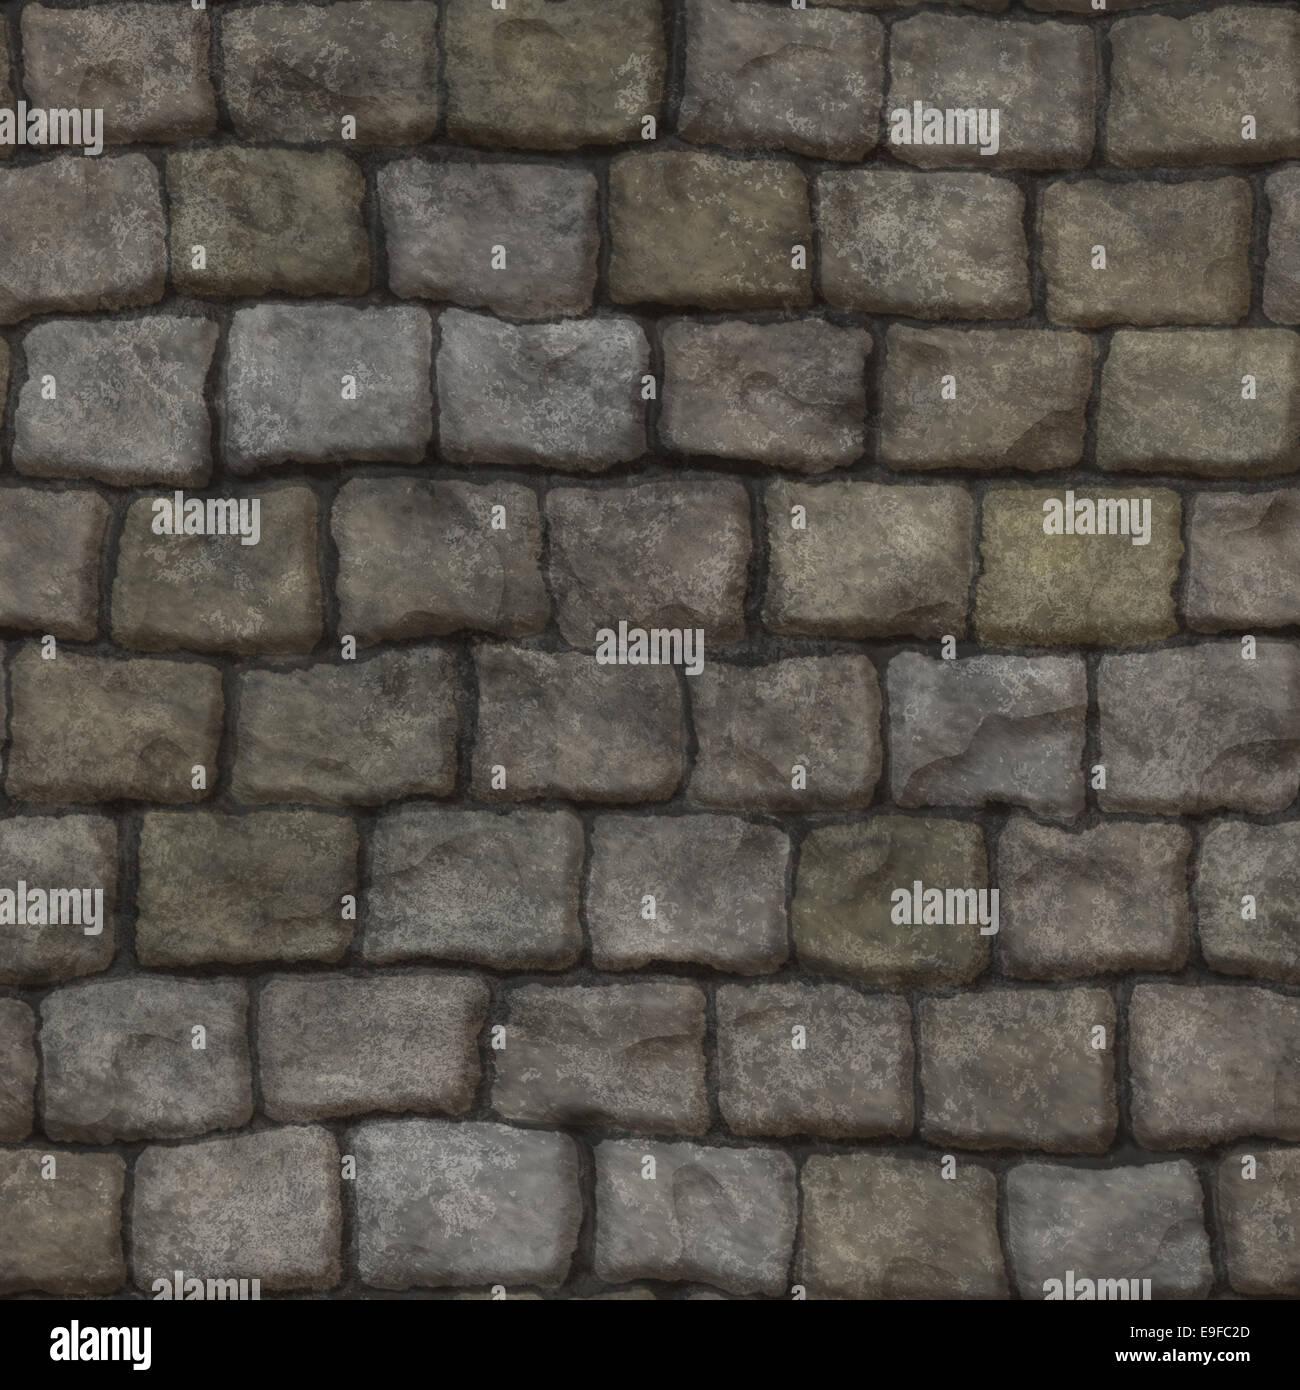 Seamless stone wall - Stock Image